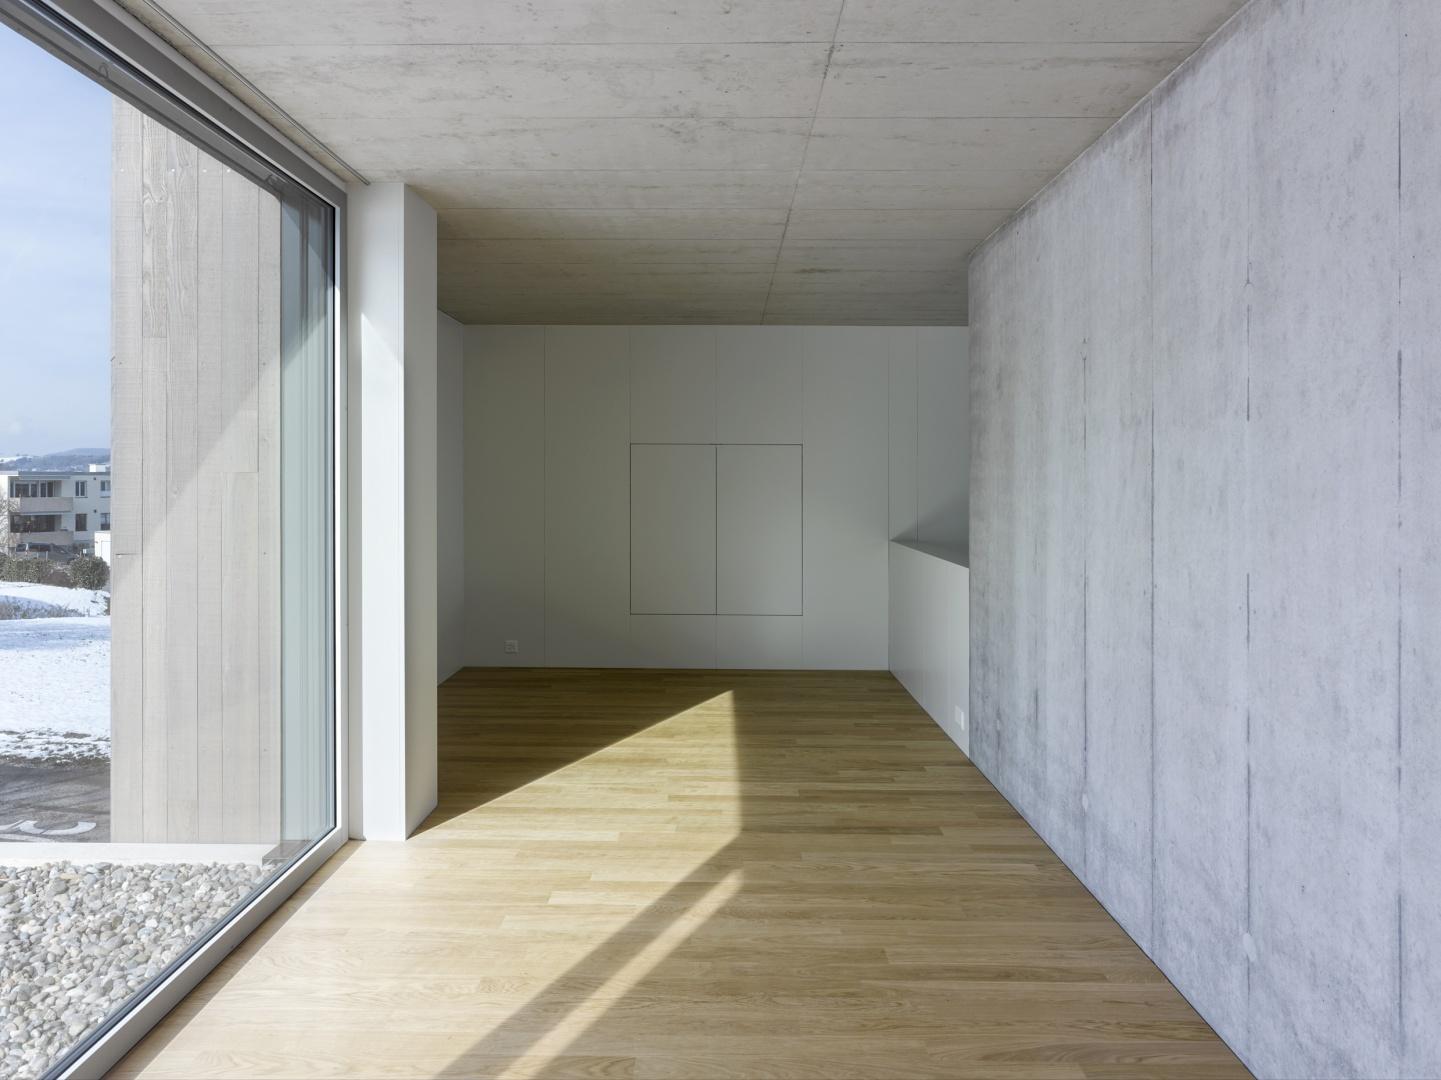 Galerieraum © Alexander Gempeler, Architekturfotografie Gempeler, Seidenweg 8a, Postfach 524, 3000 Bern 9